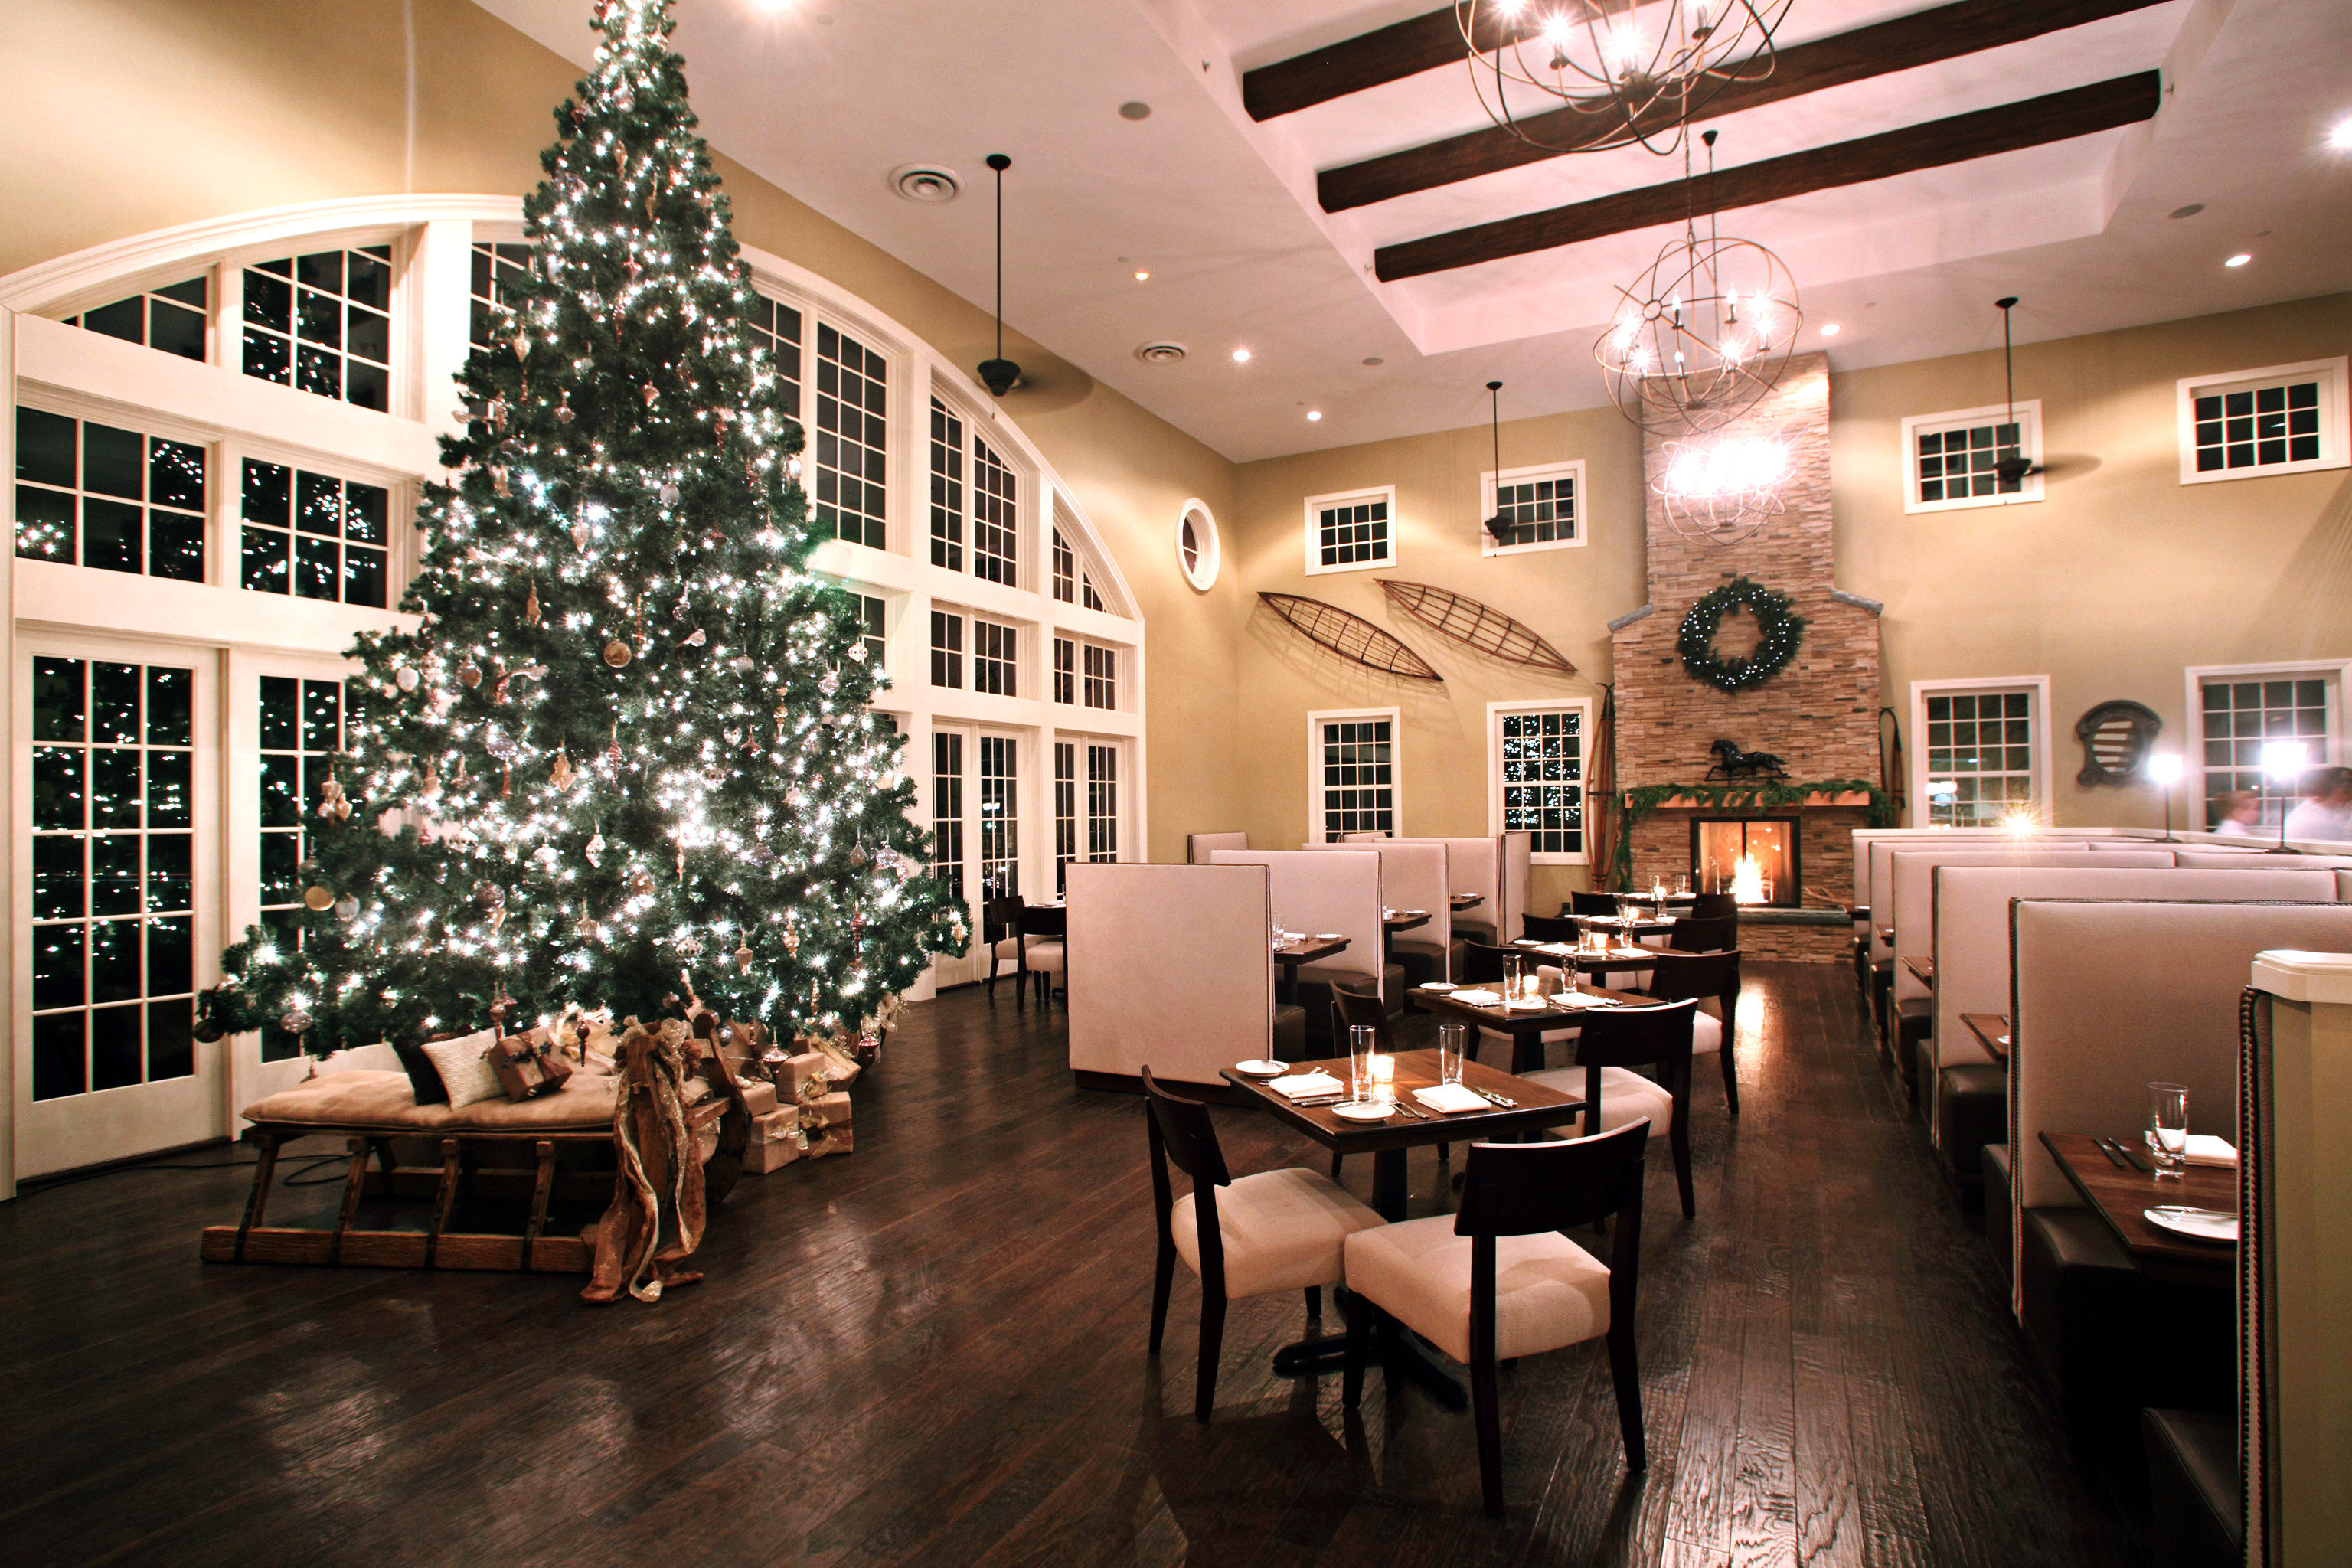 Dining Drink Eat Lobby restaurant function hall café basement